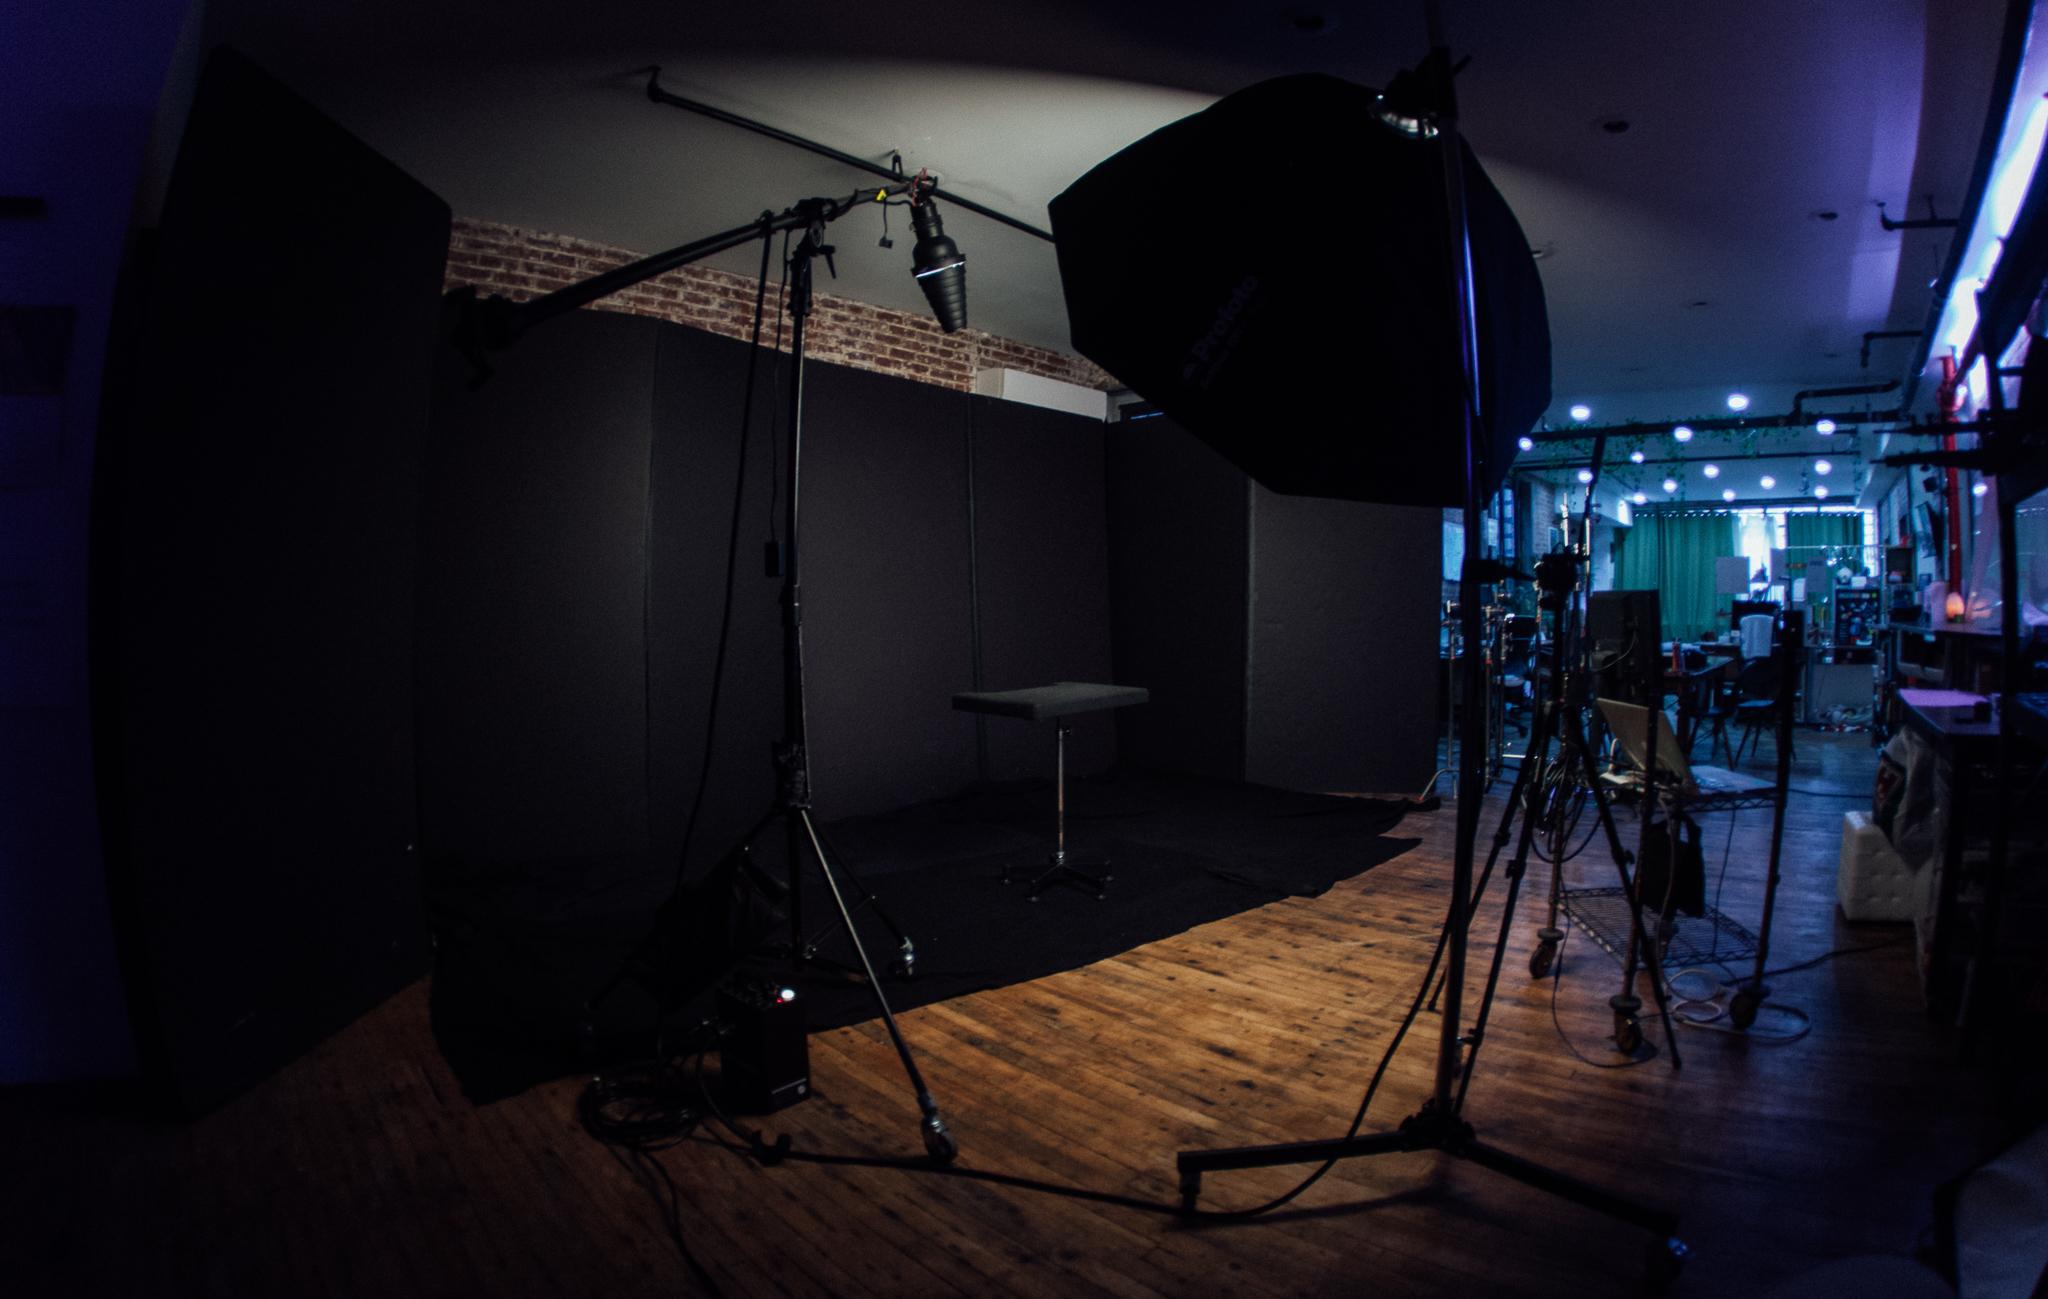 Black backdrop for interviews